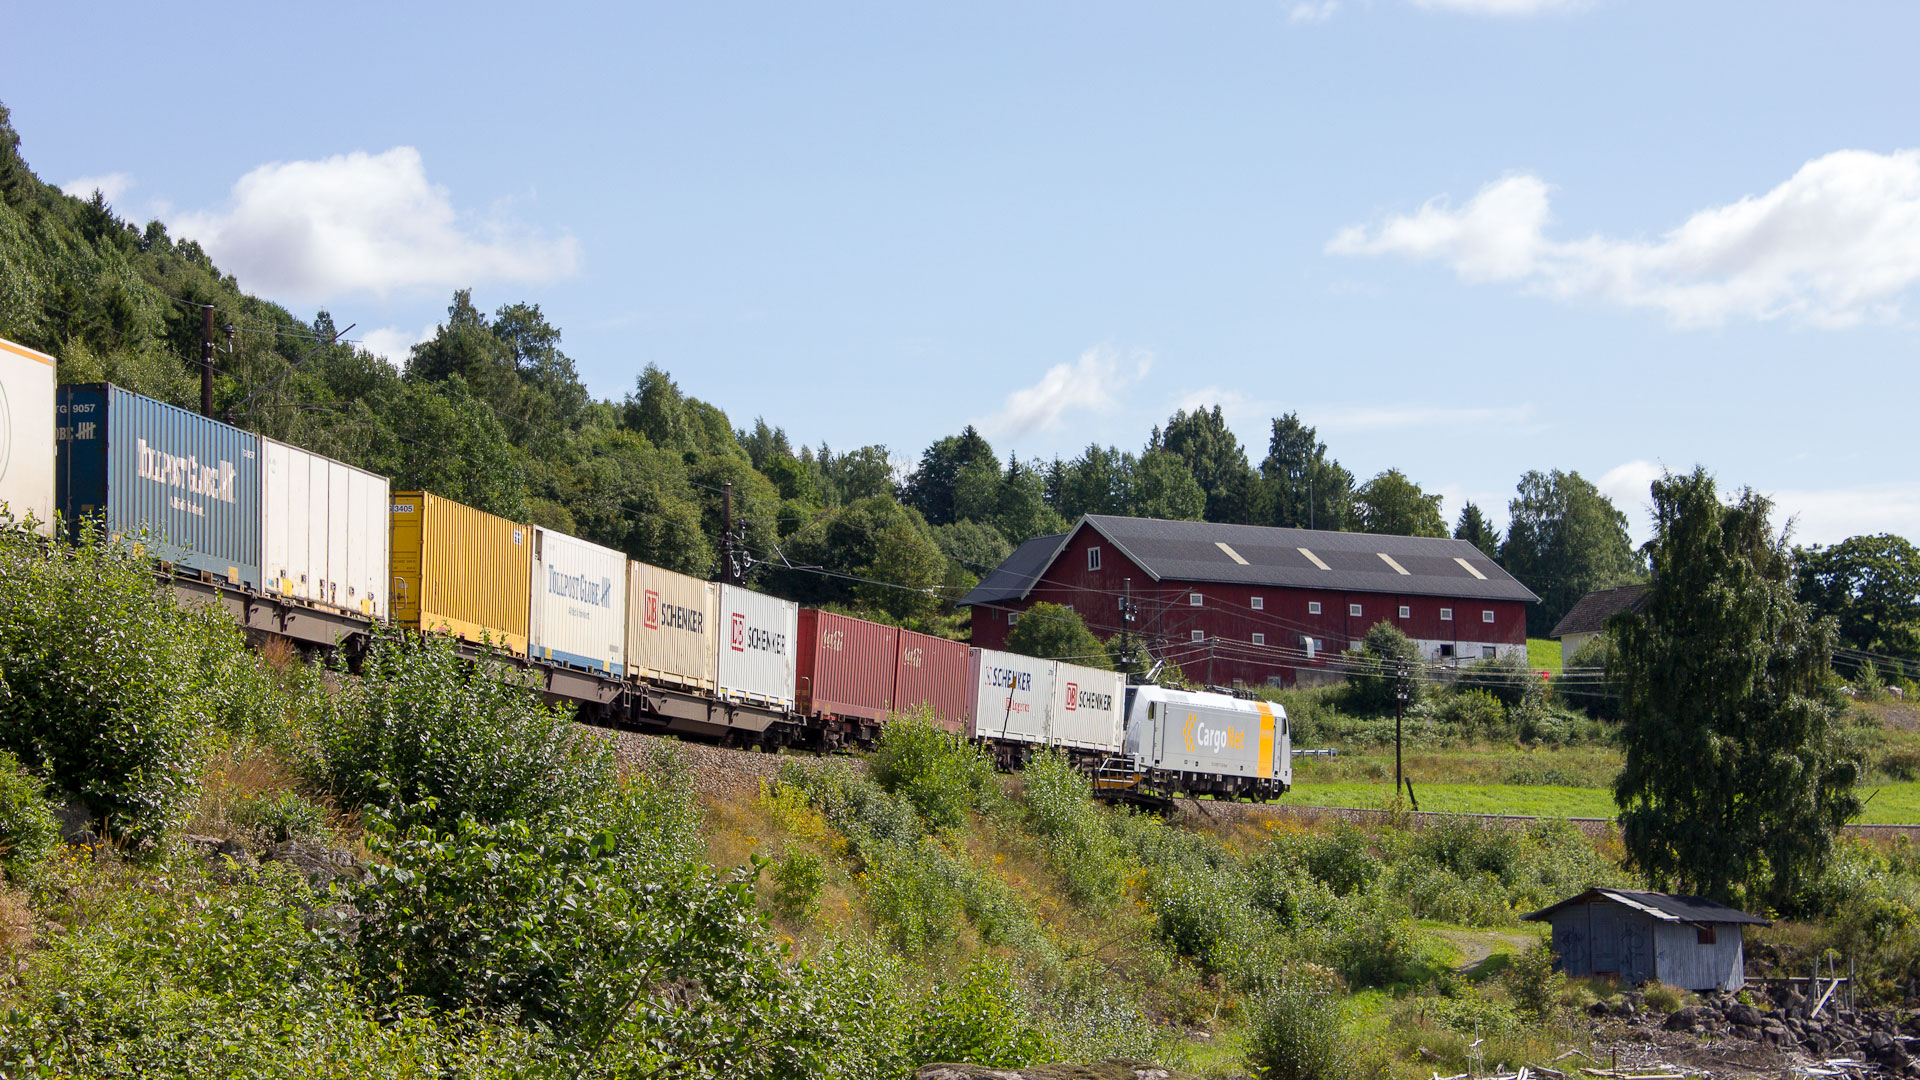 Cargo delivery train